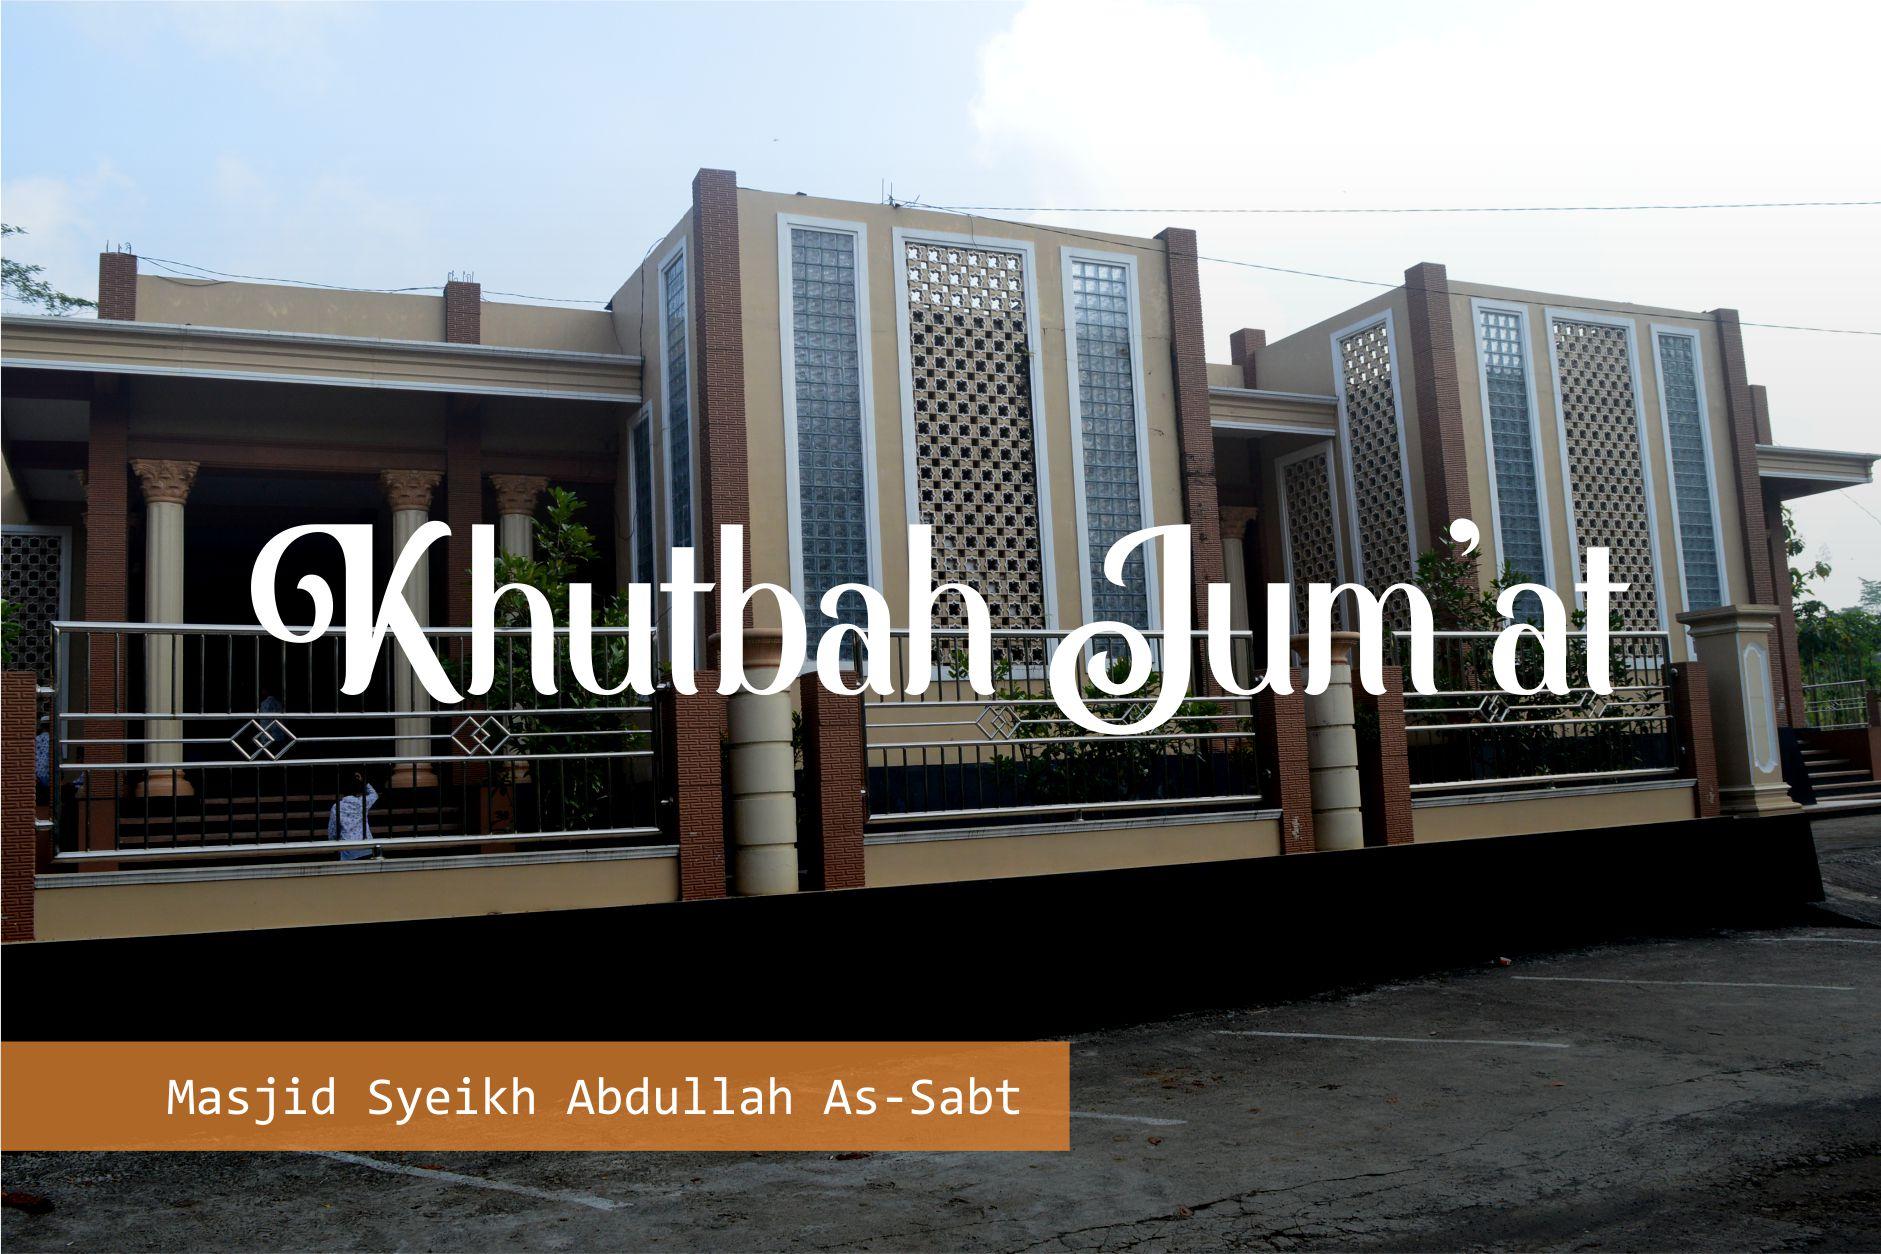 Khutbah Jum'at: Tafsir Surat Al-Ghasyiyah – Ustadz Fathurrahman